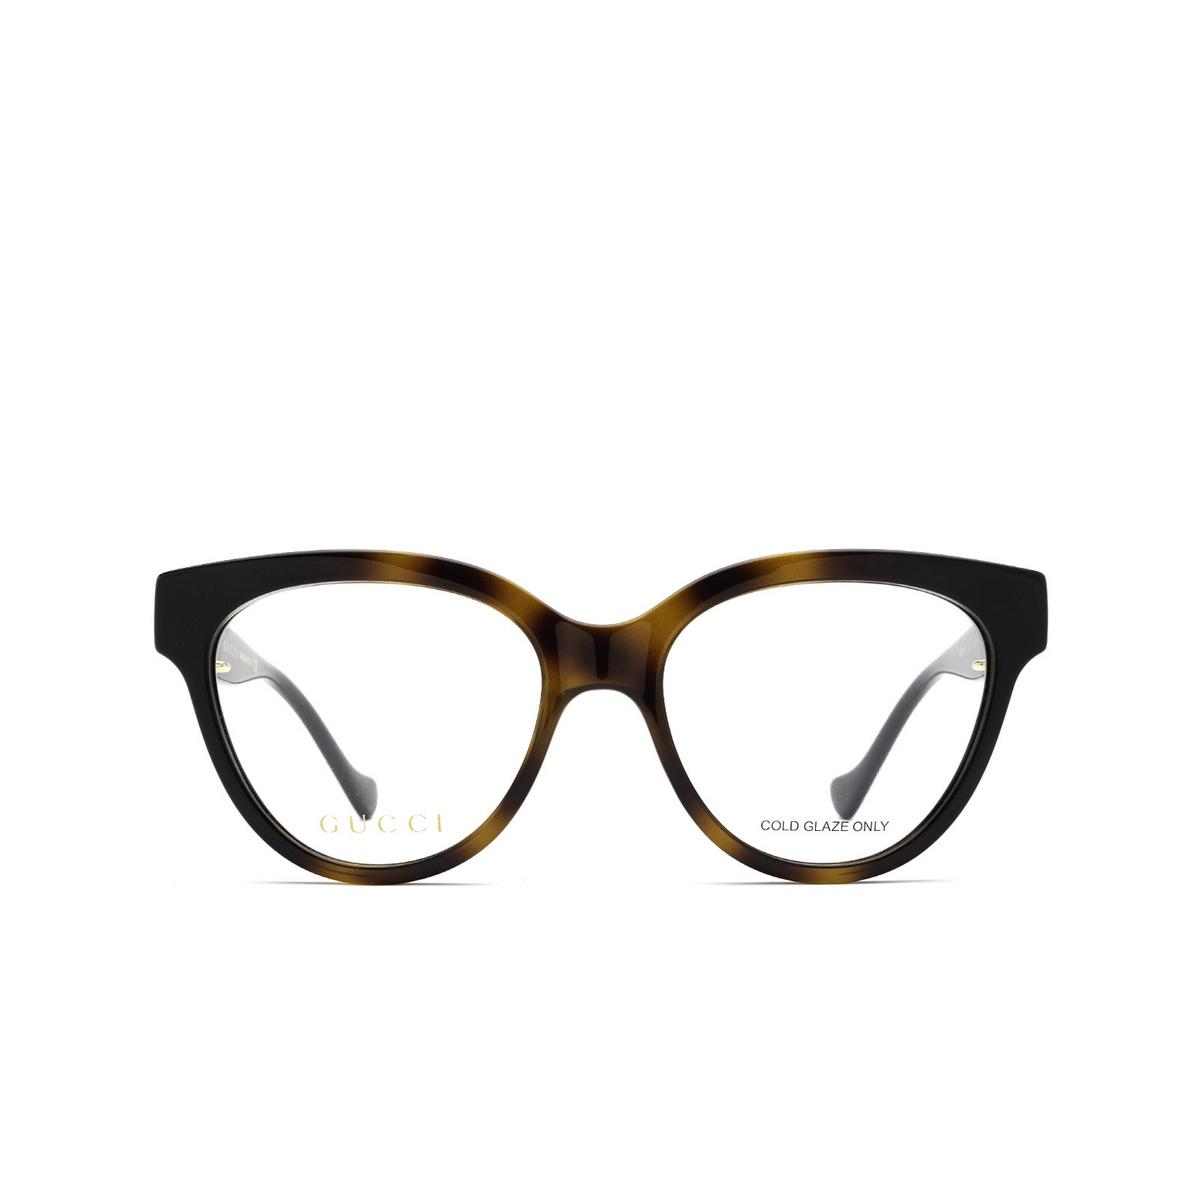 Gucci® Oval Eyeglasses: GG1024O color Black & Havana 002 - front view.